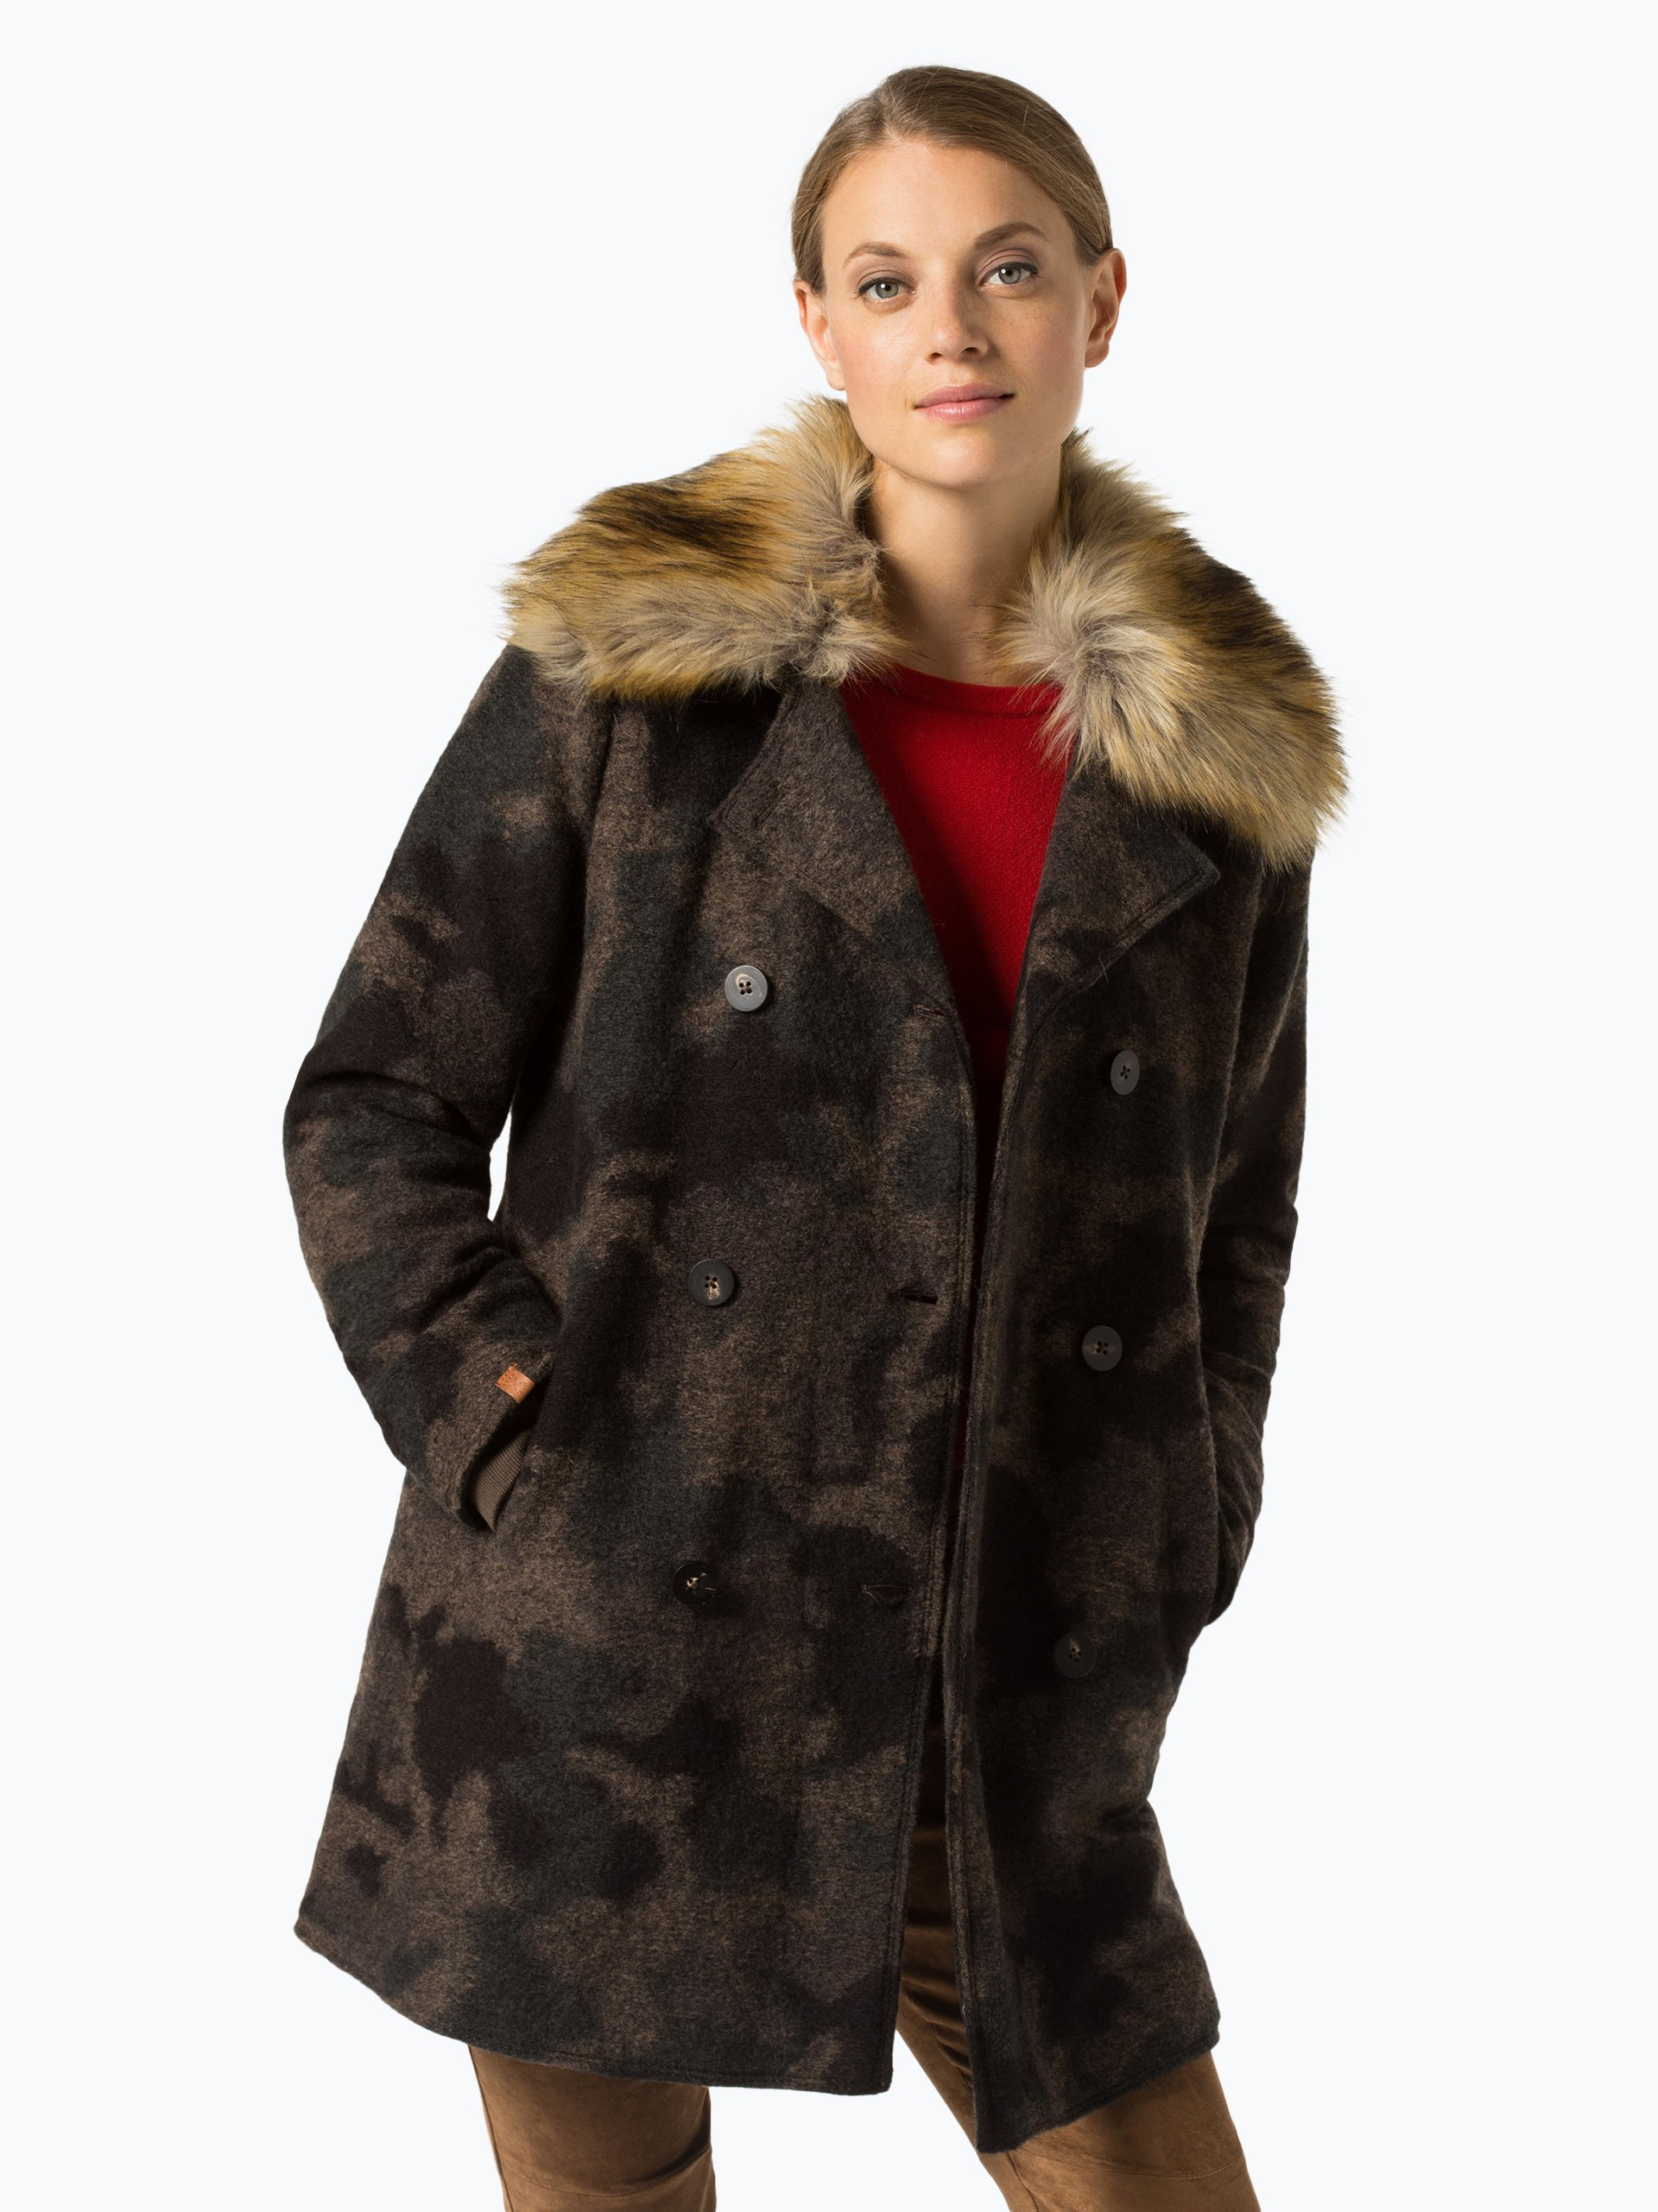 camel active damen mantel 2 online kaufen peek und cloppenburg de. Black Bedroom Furniture Sets. Home Design Ideas